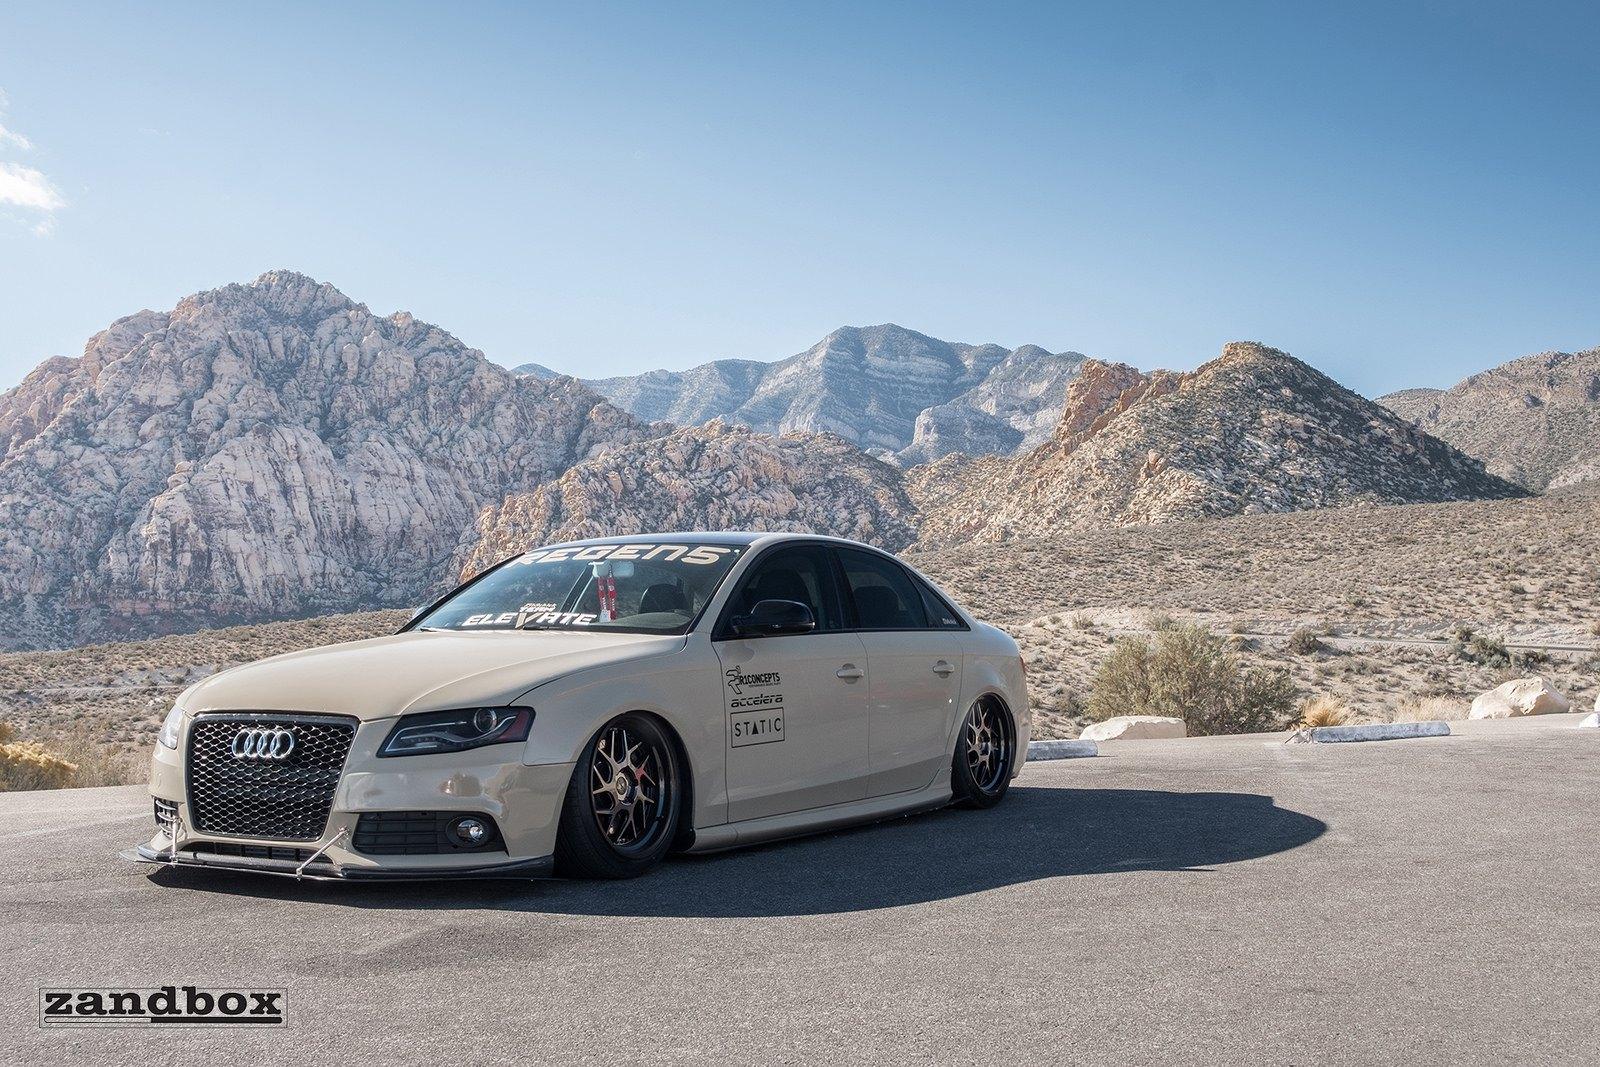 Custom 2010 Audi A4 Images Mods Photos Upgrades